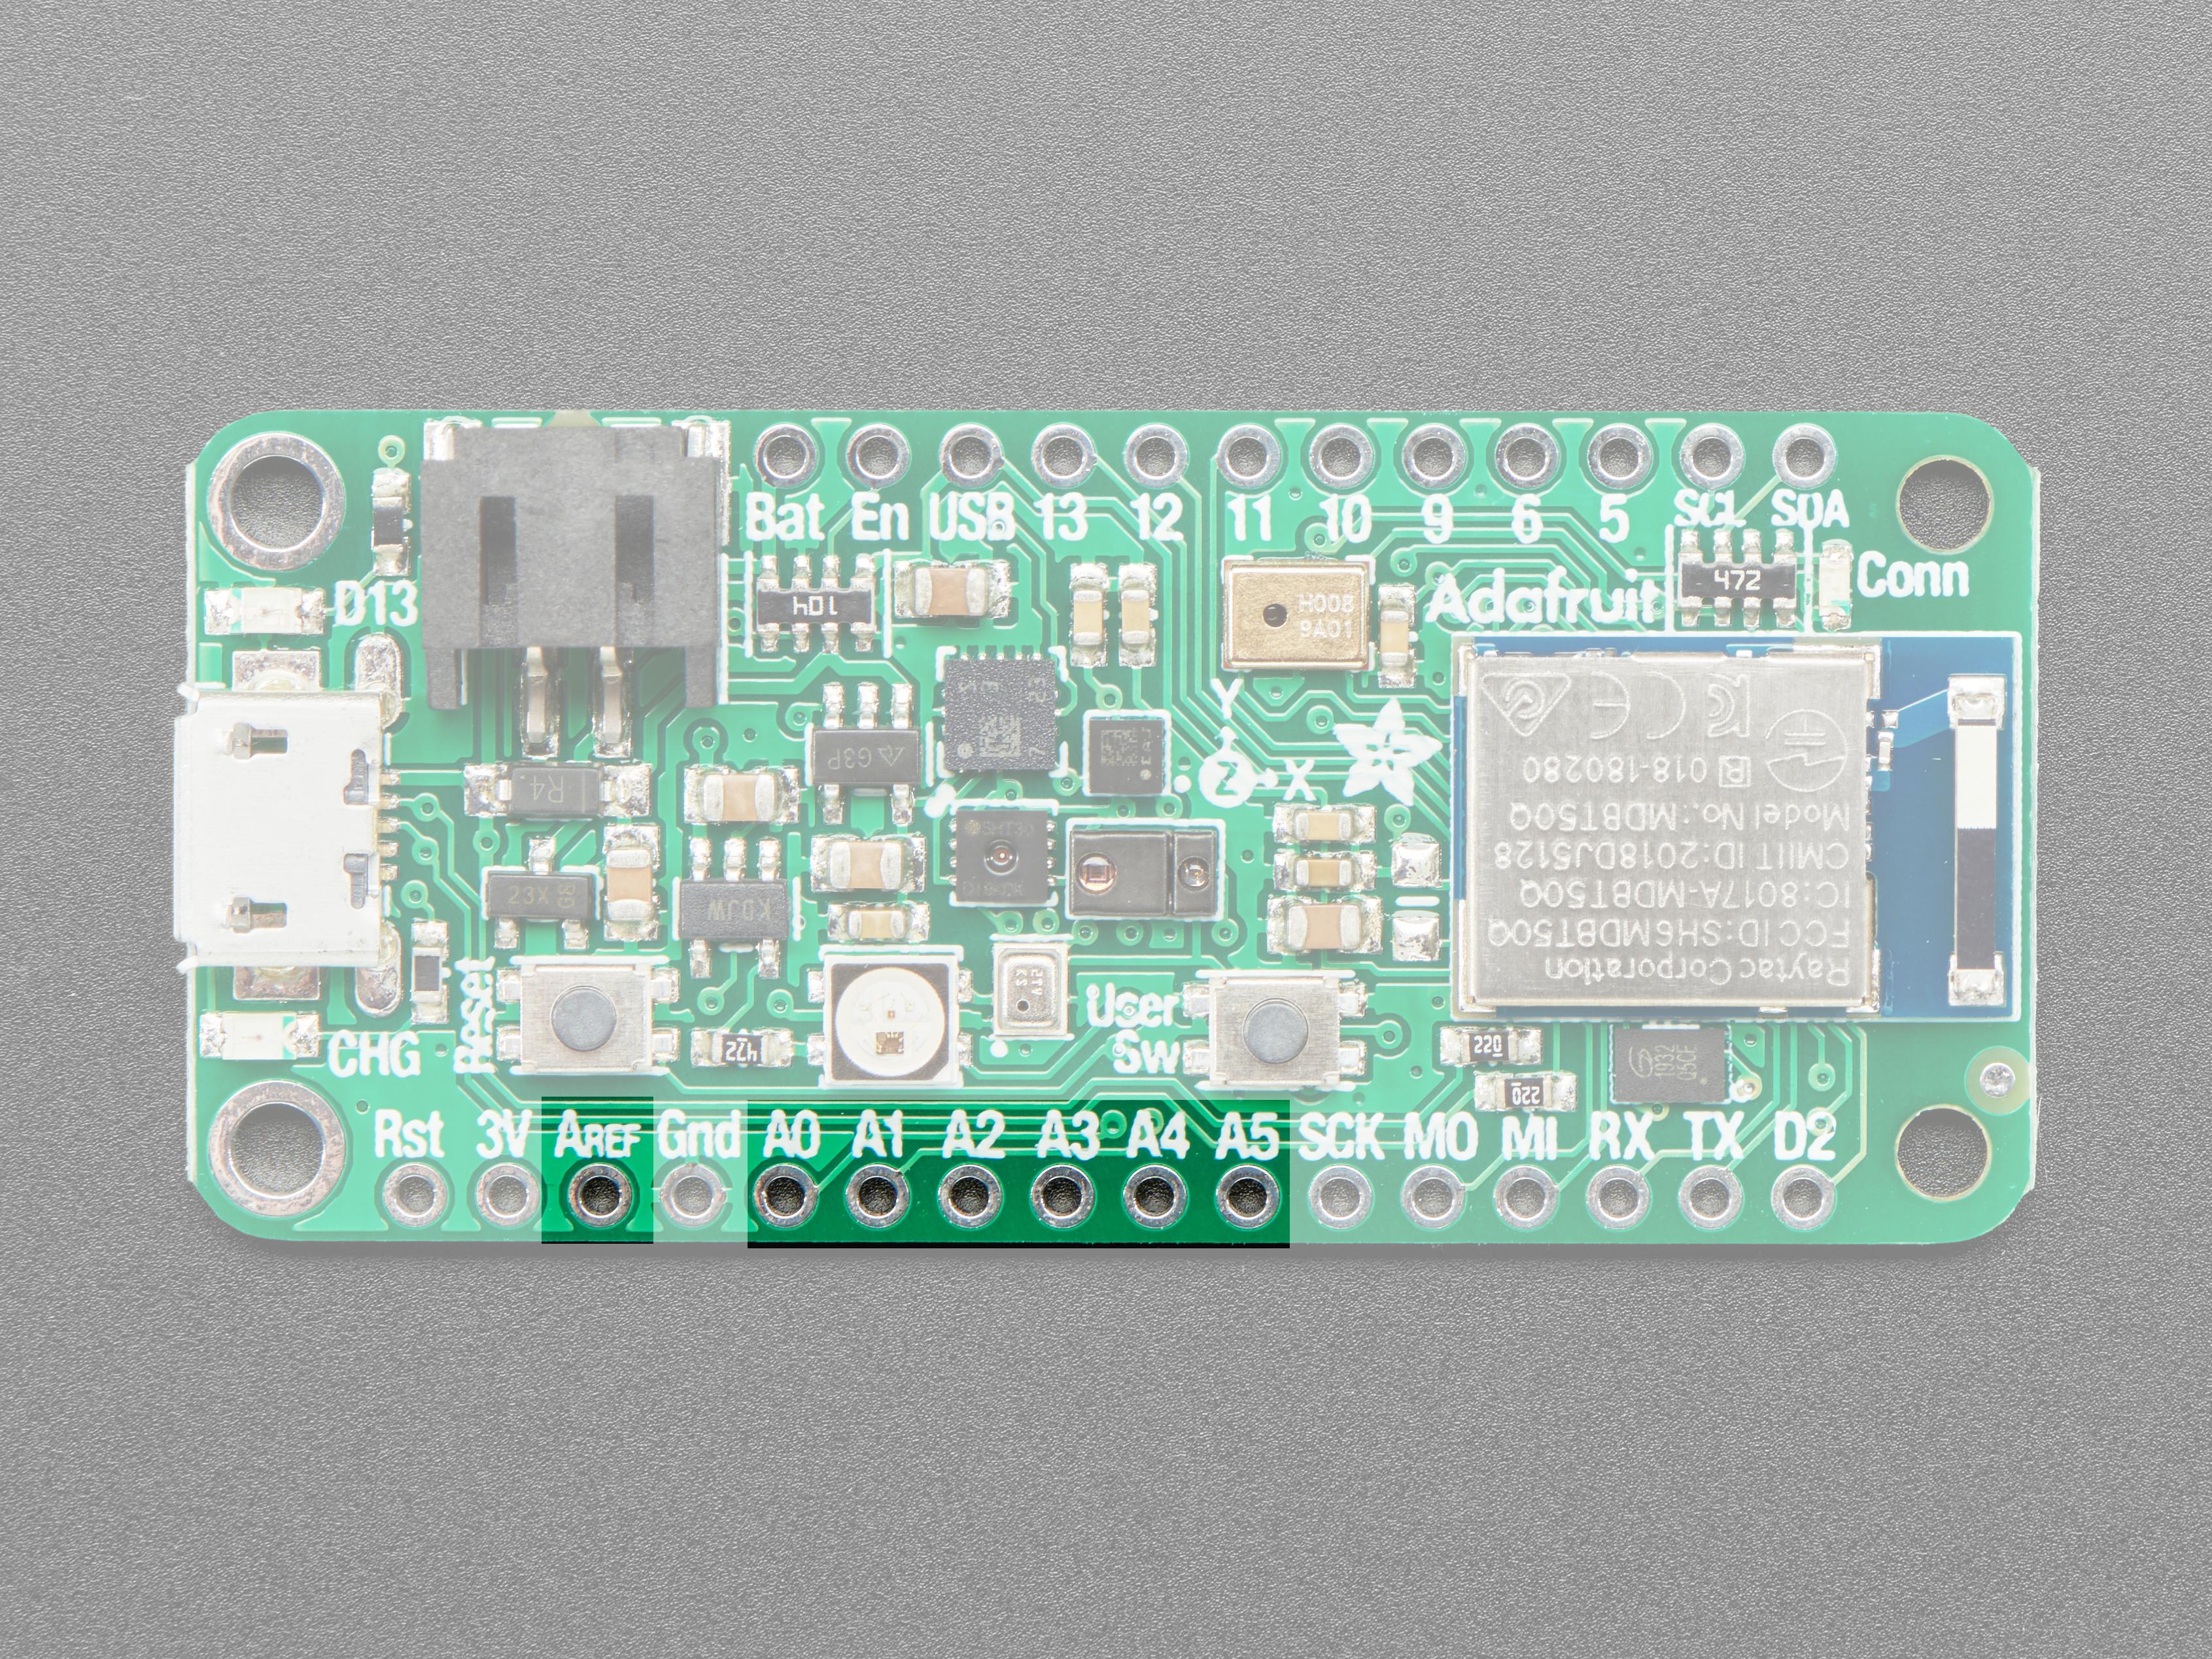 sensors_Feather_Sense_pinouts_analog_pins.png